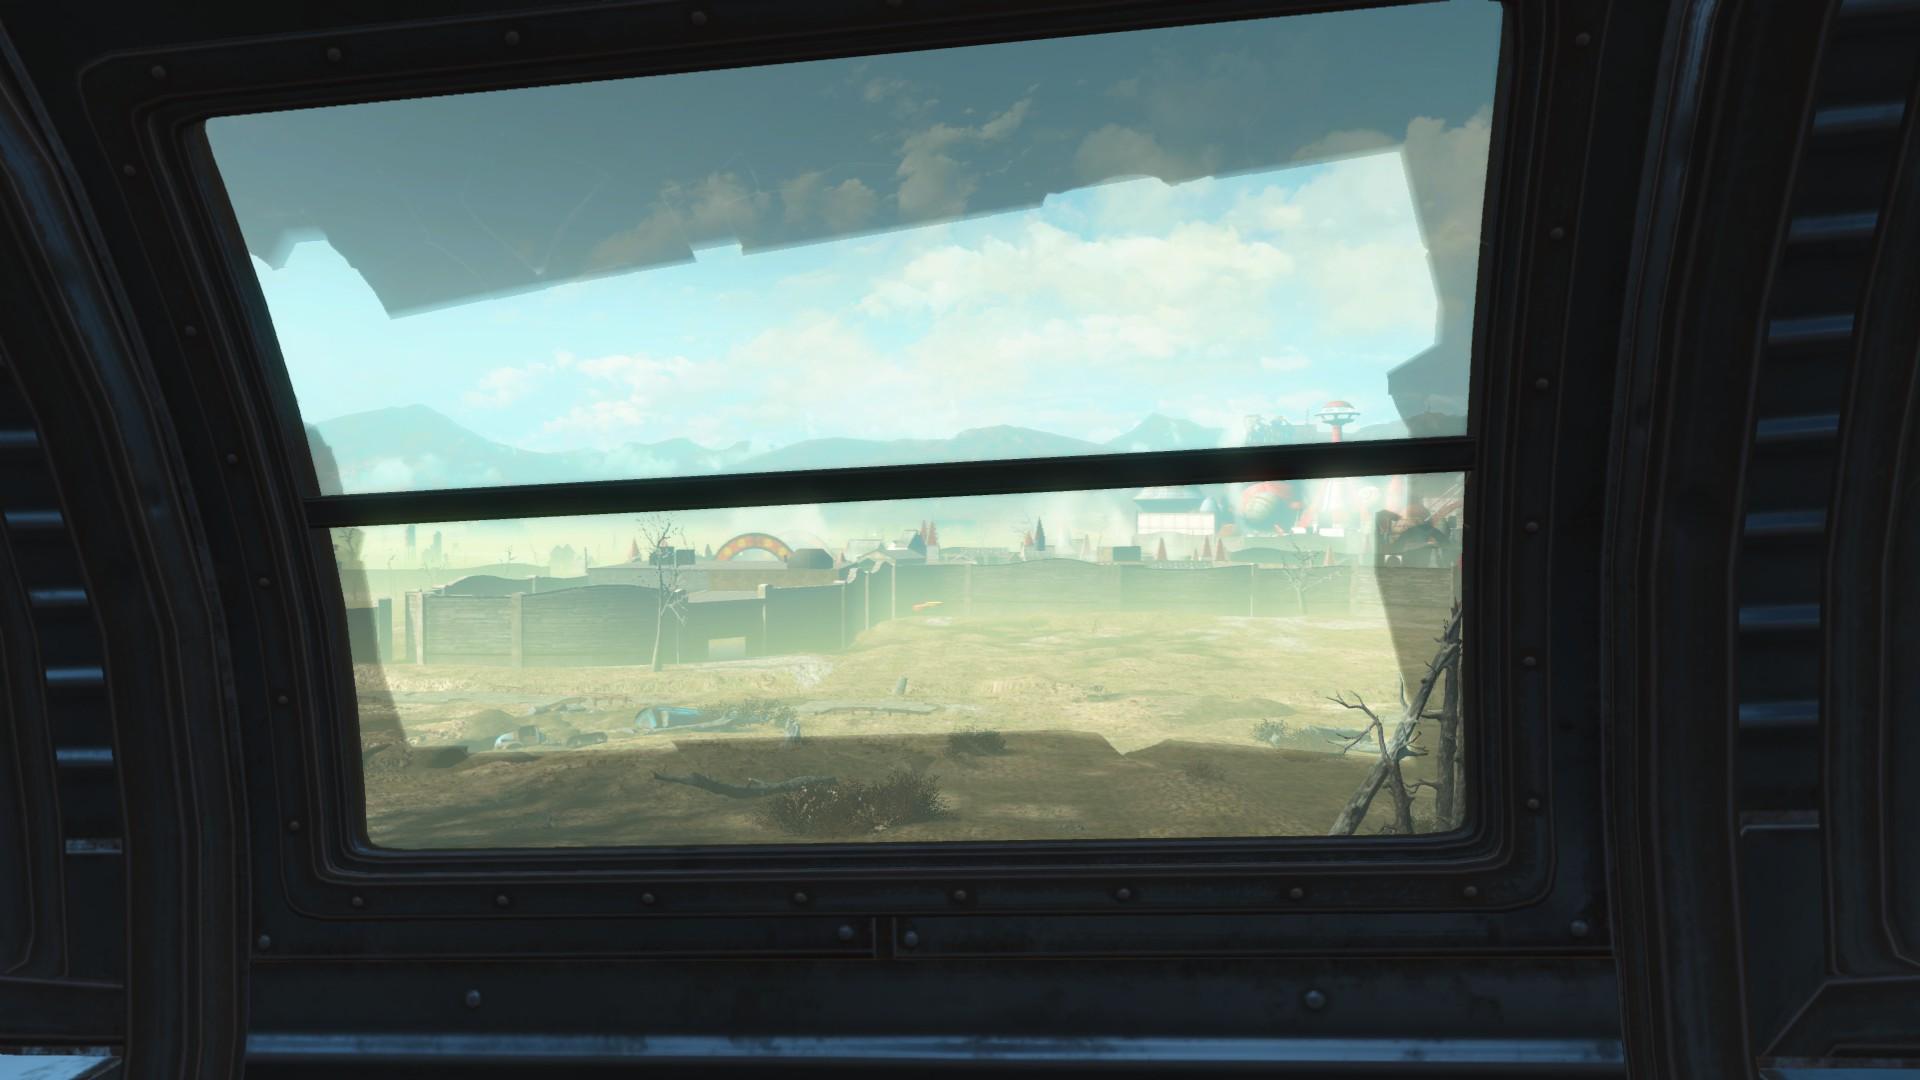 20171008180518_1.jpg - Fallout 4